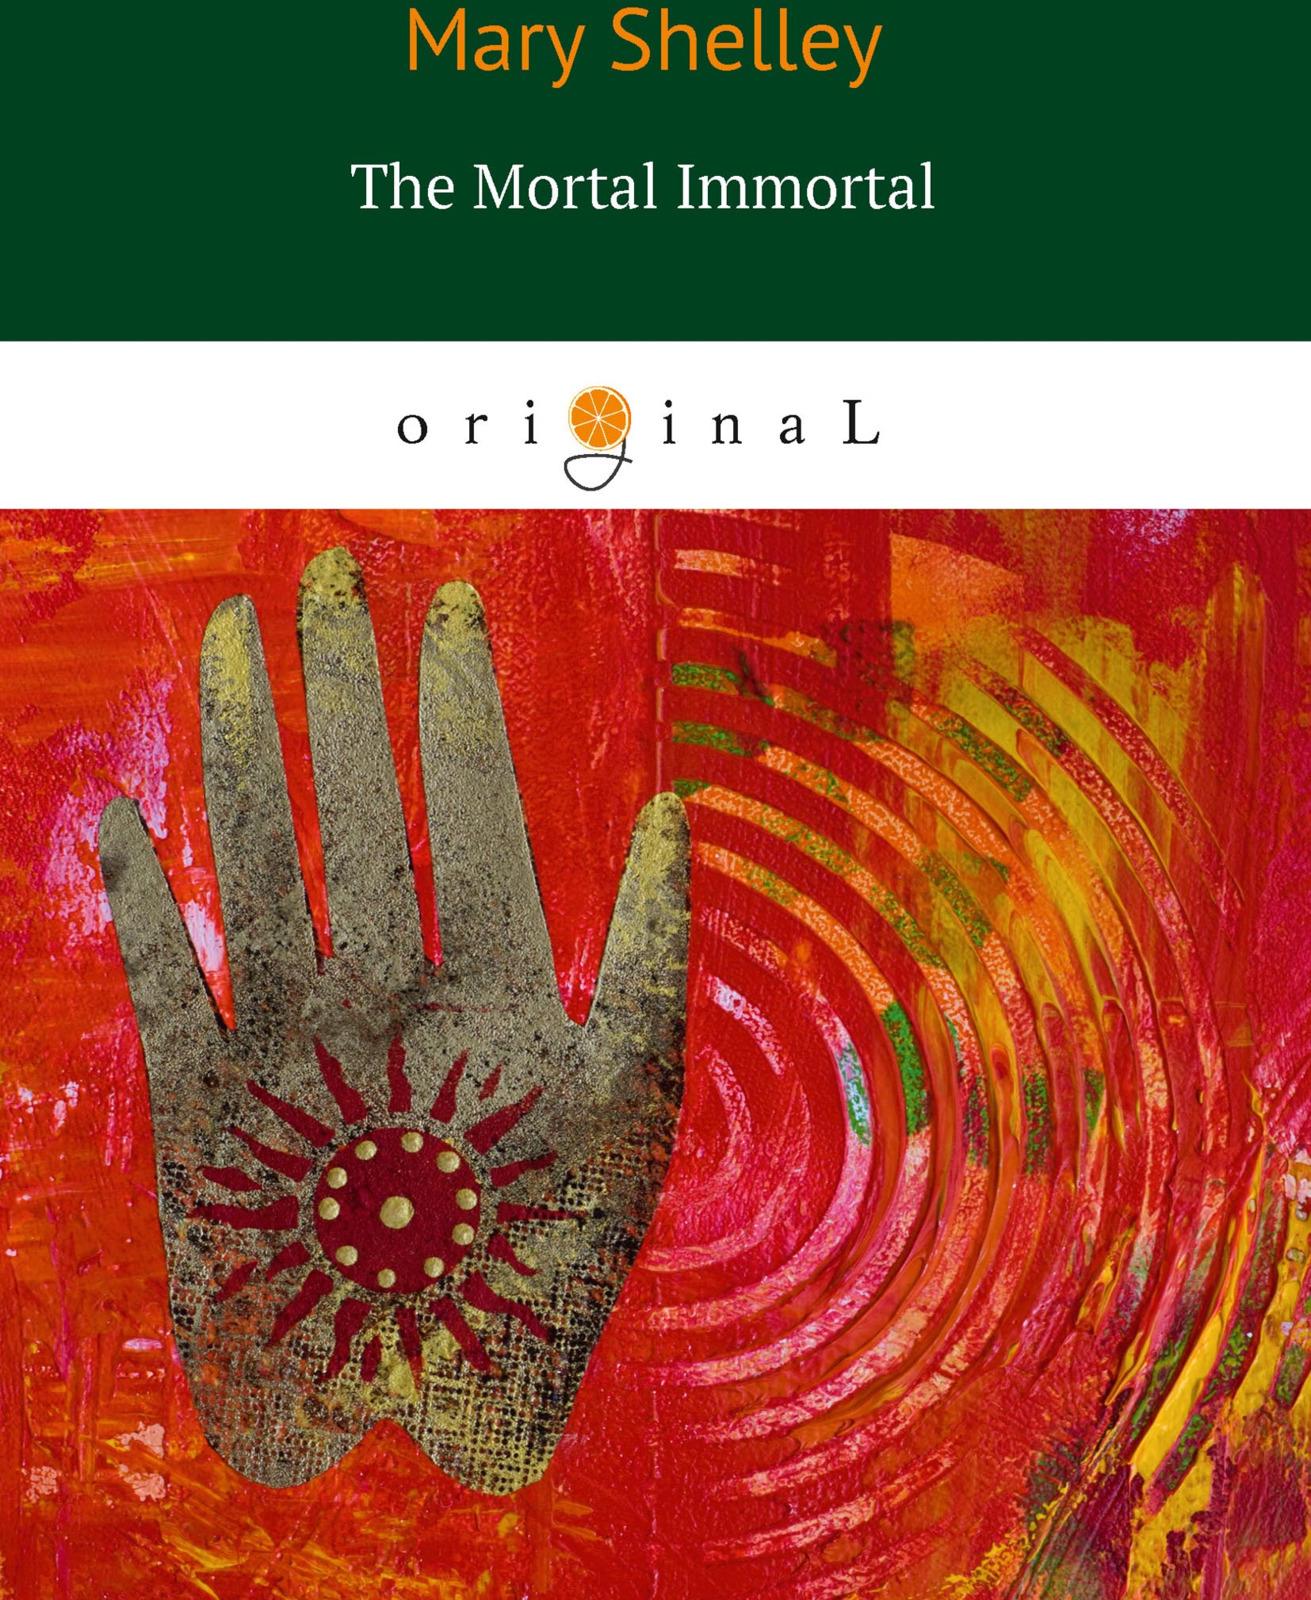 Mary Shelley The Mortal Immortal